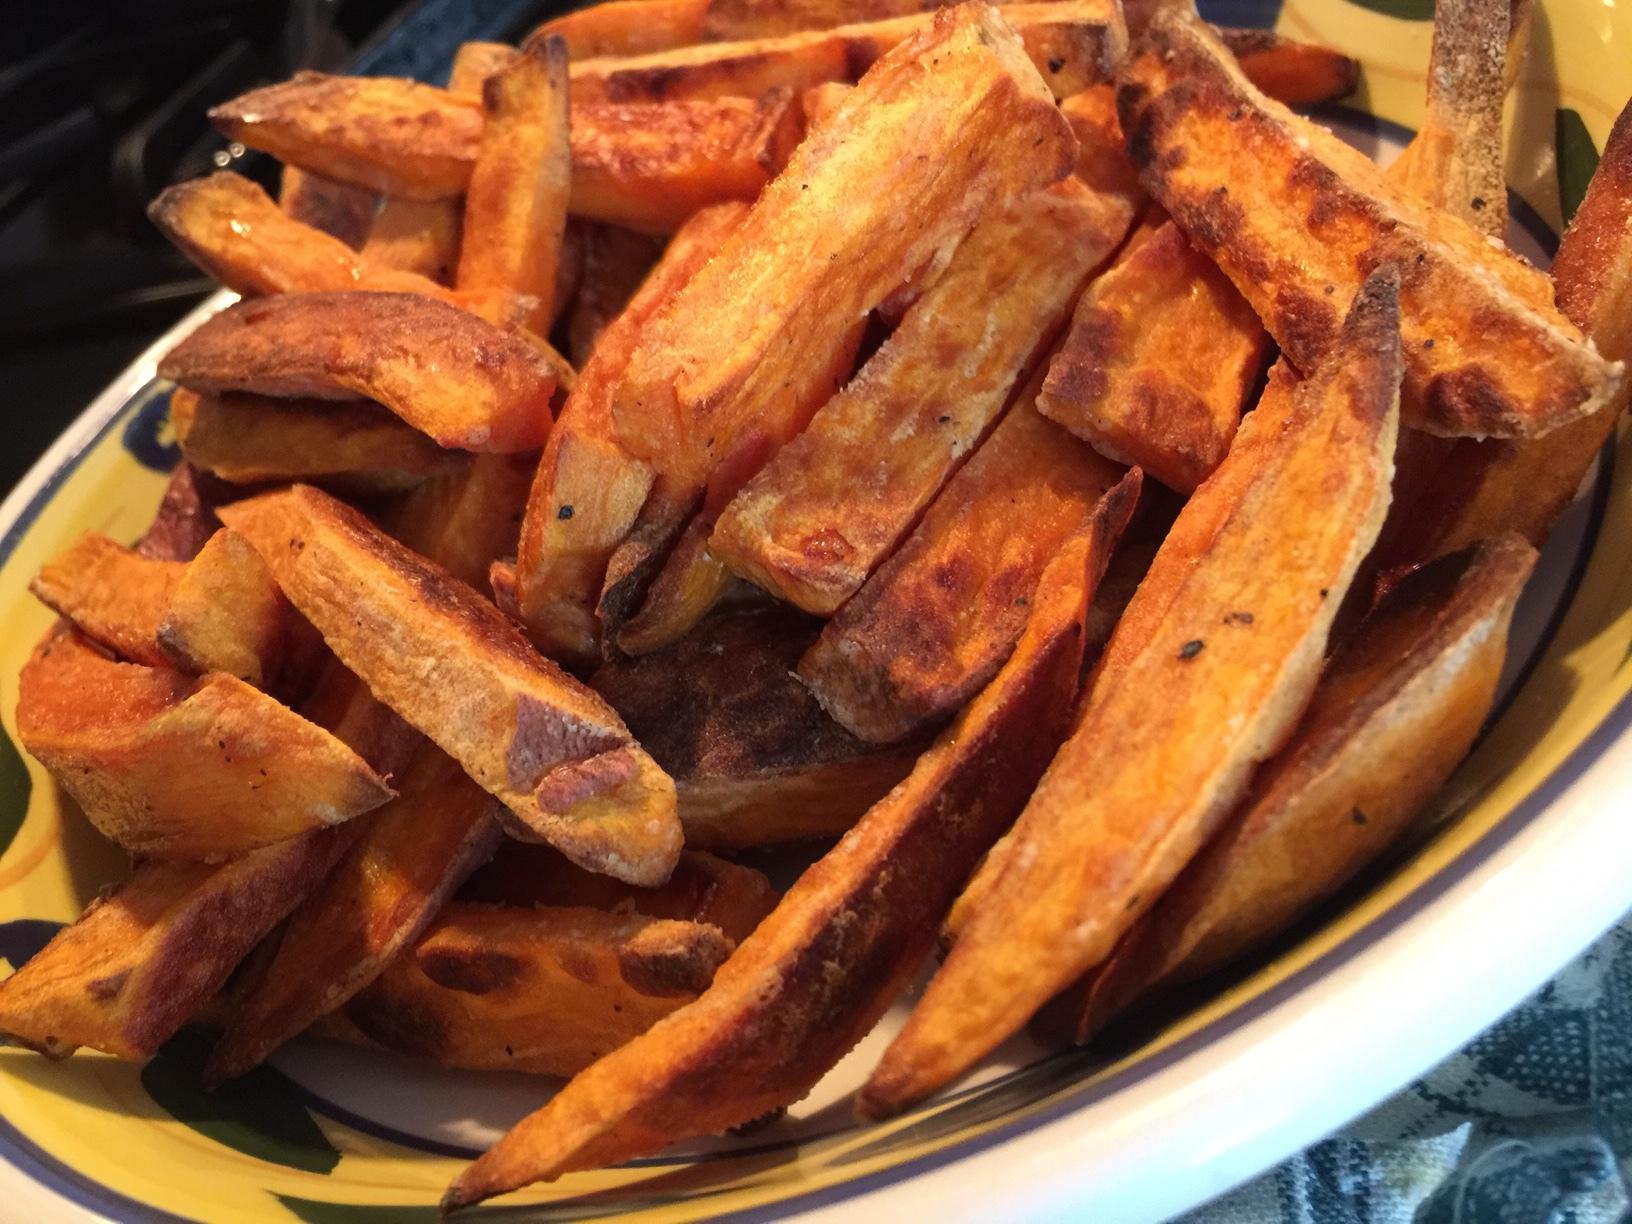 eating_understood_baked_french_fries.JPG